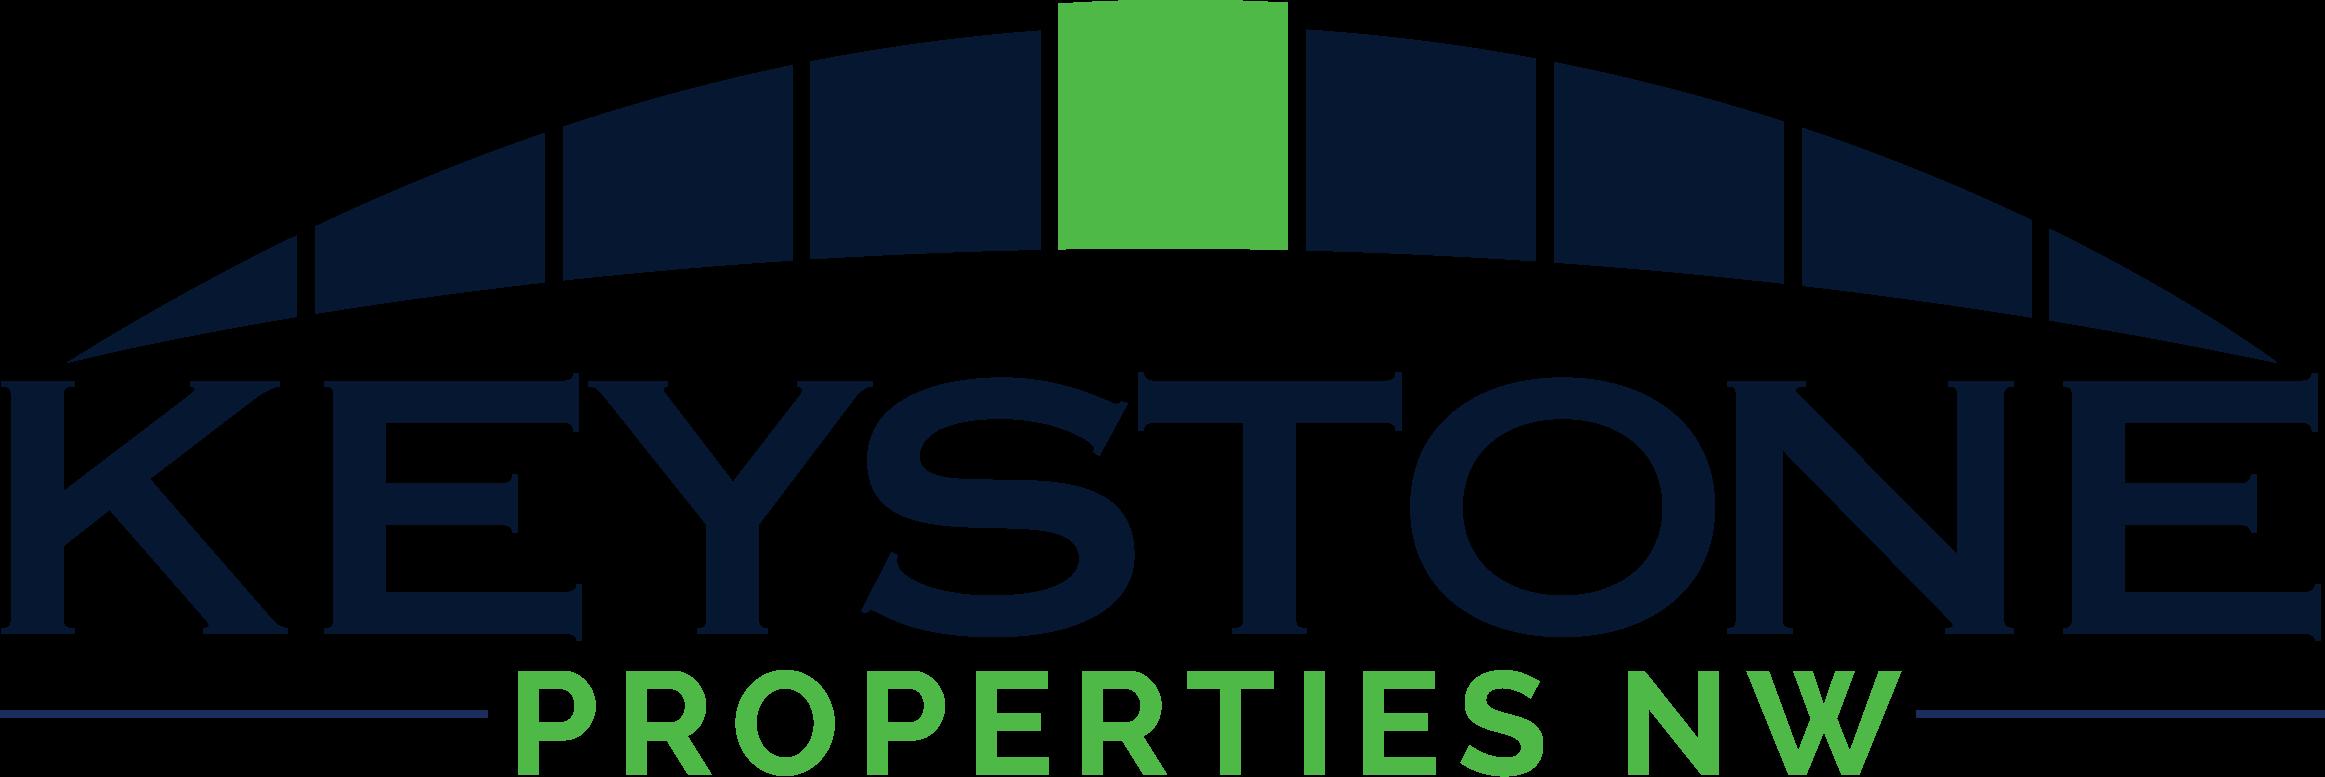 Keystone Properties NW